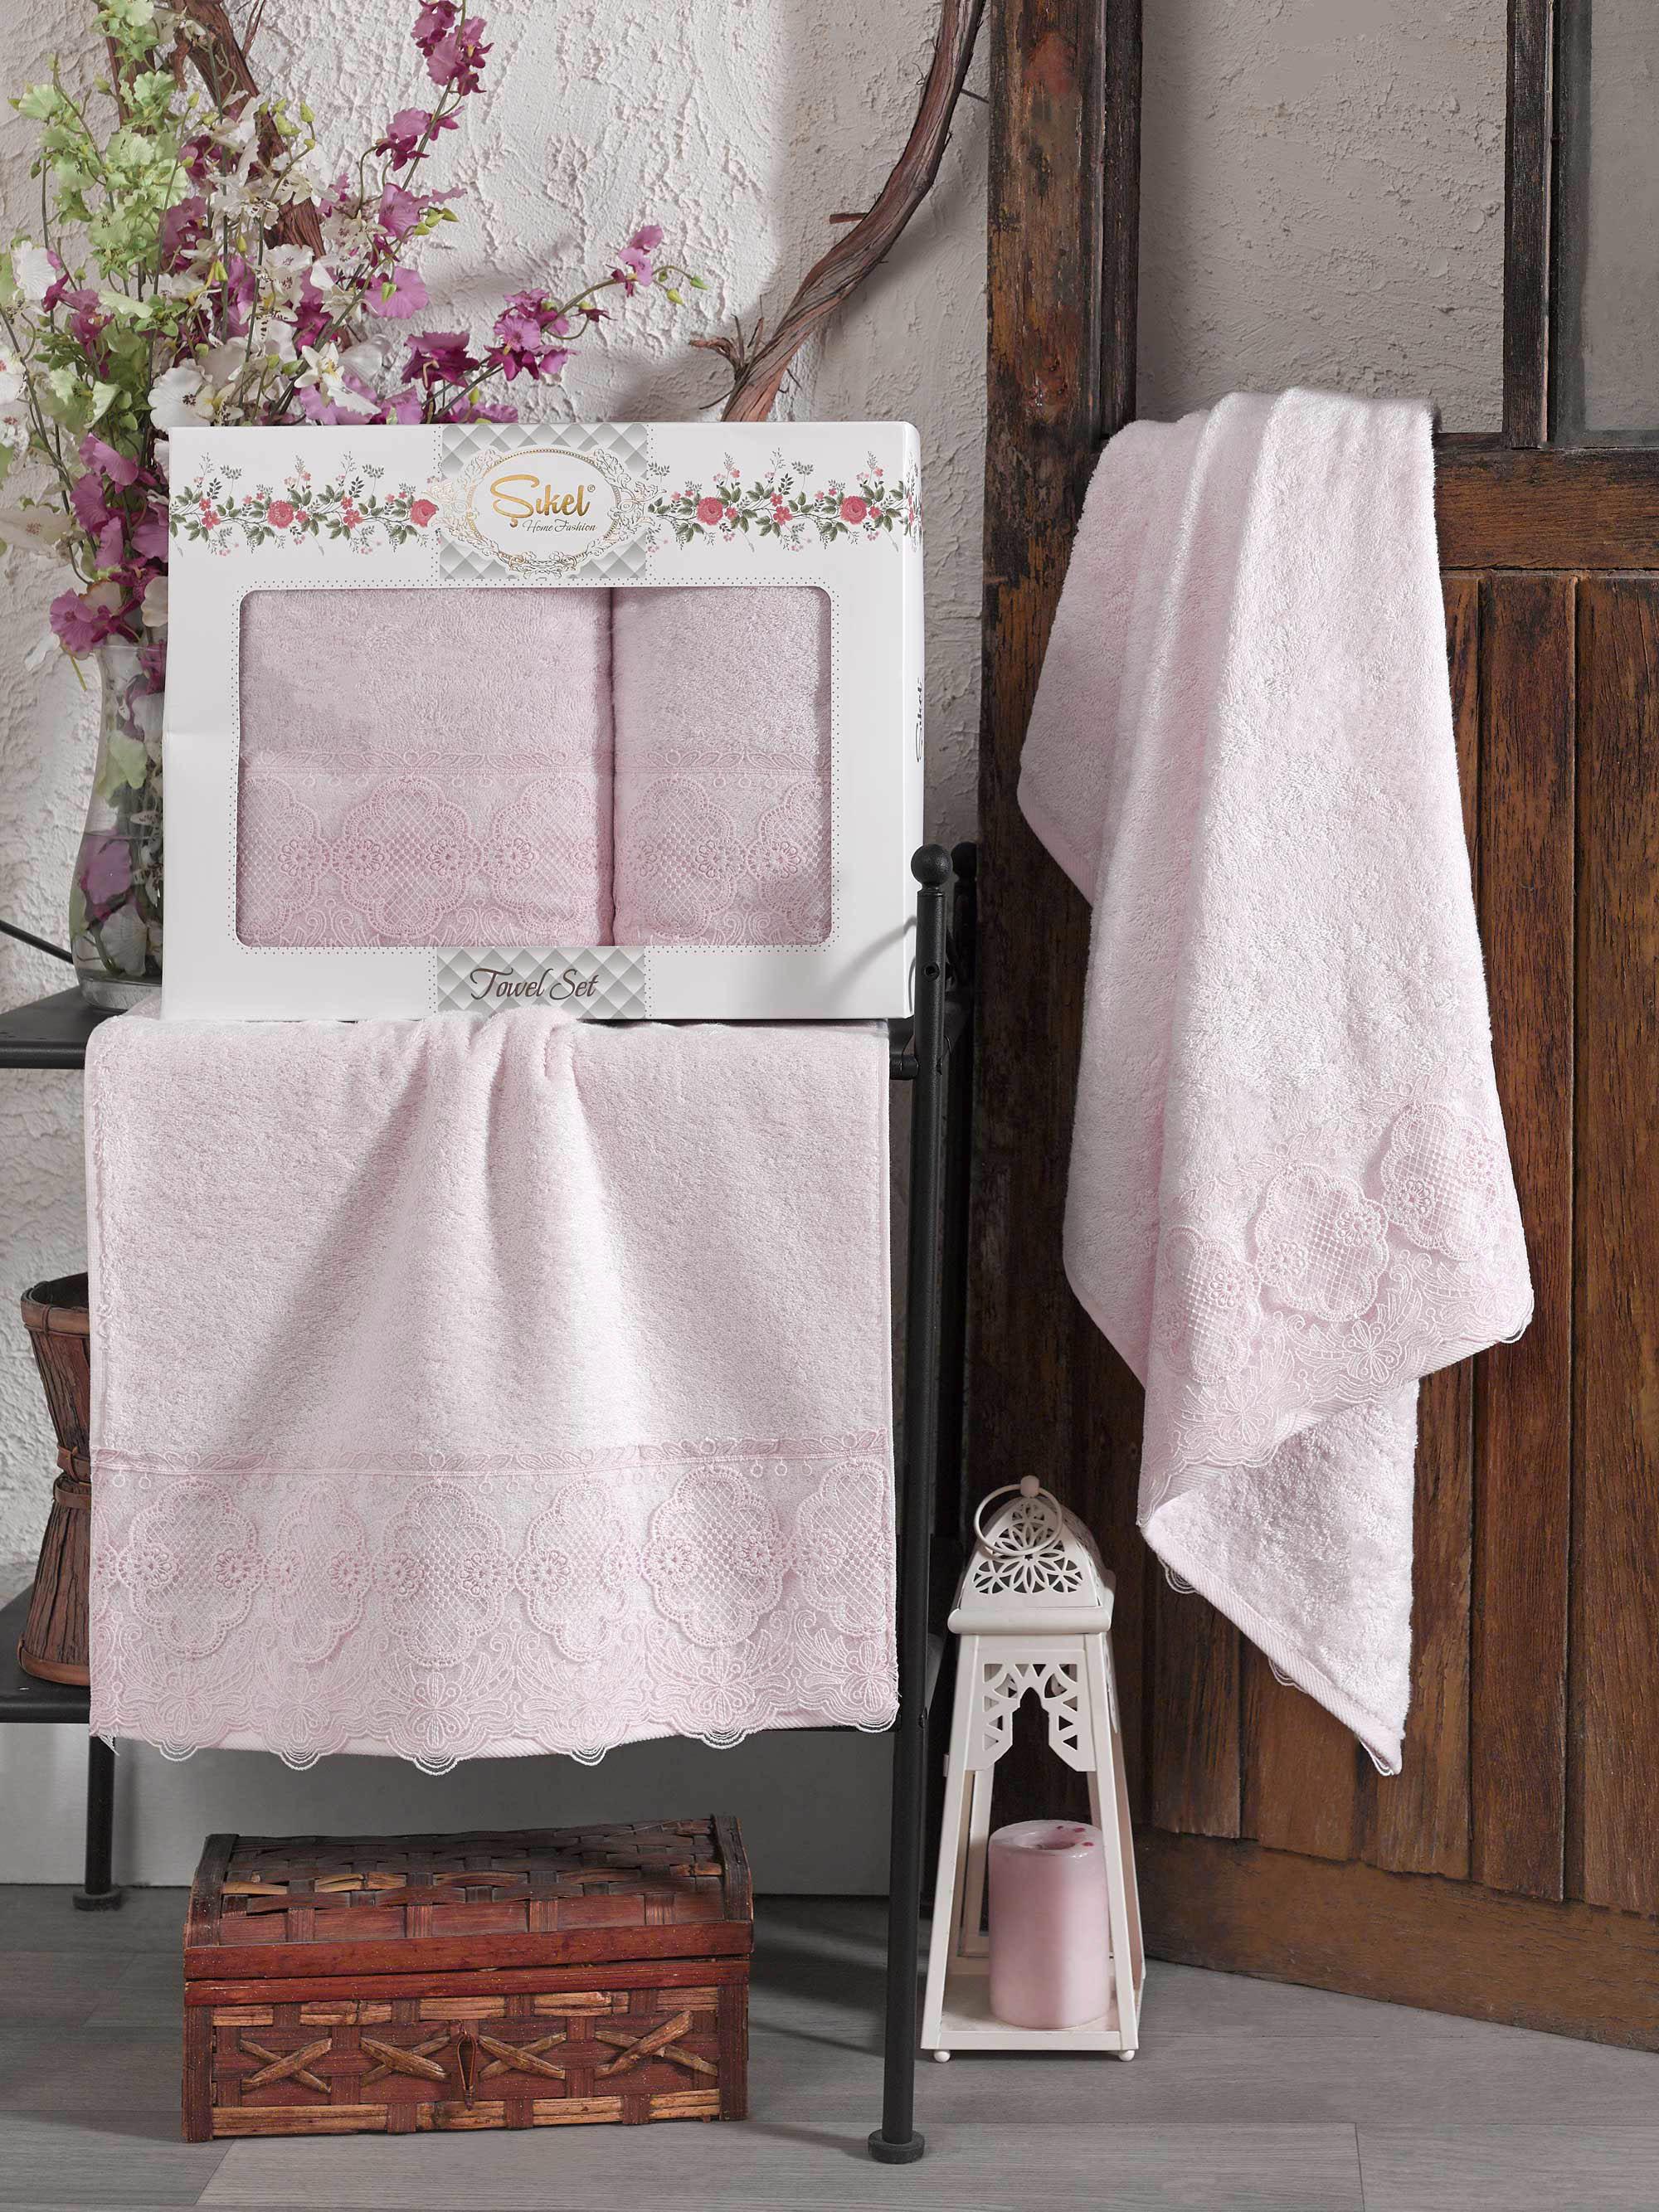 Полотенца Sikel Полотенце Solemare Цвет: Розовый (50х90 см,70х140 см) sikel набор из 2 полотенец nazande цвет коричневый